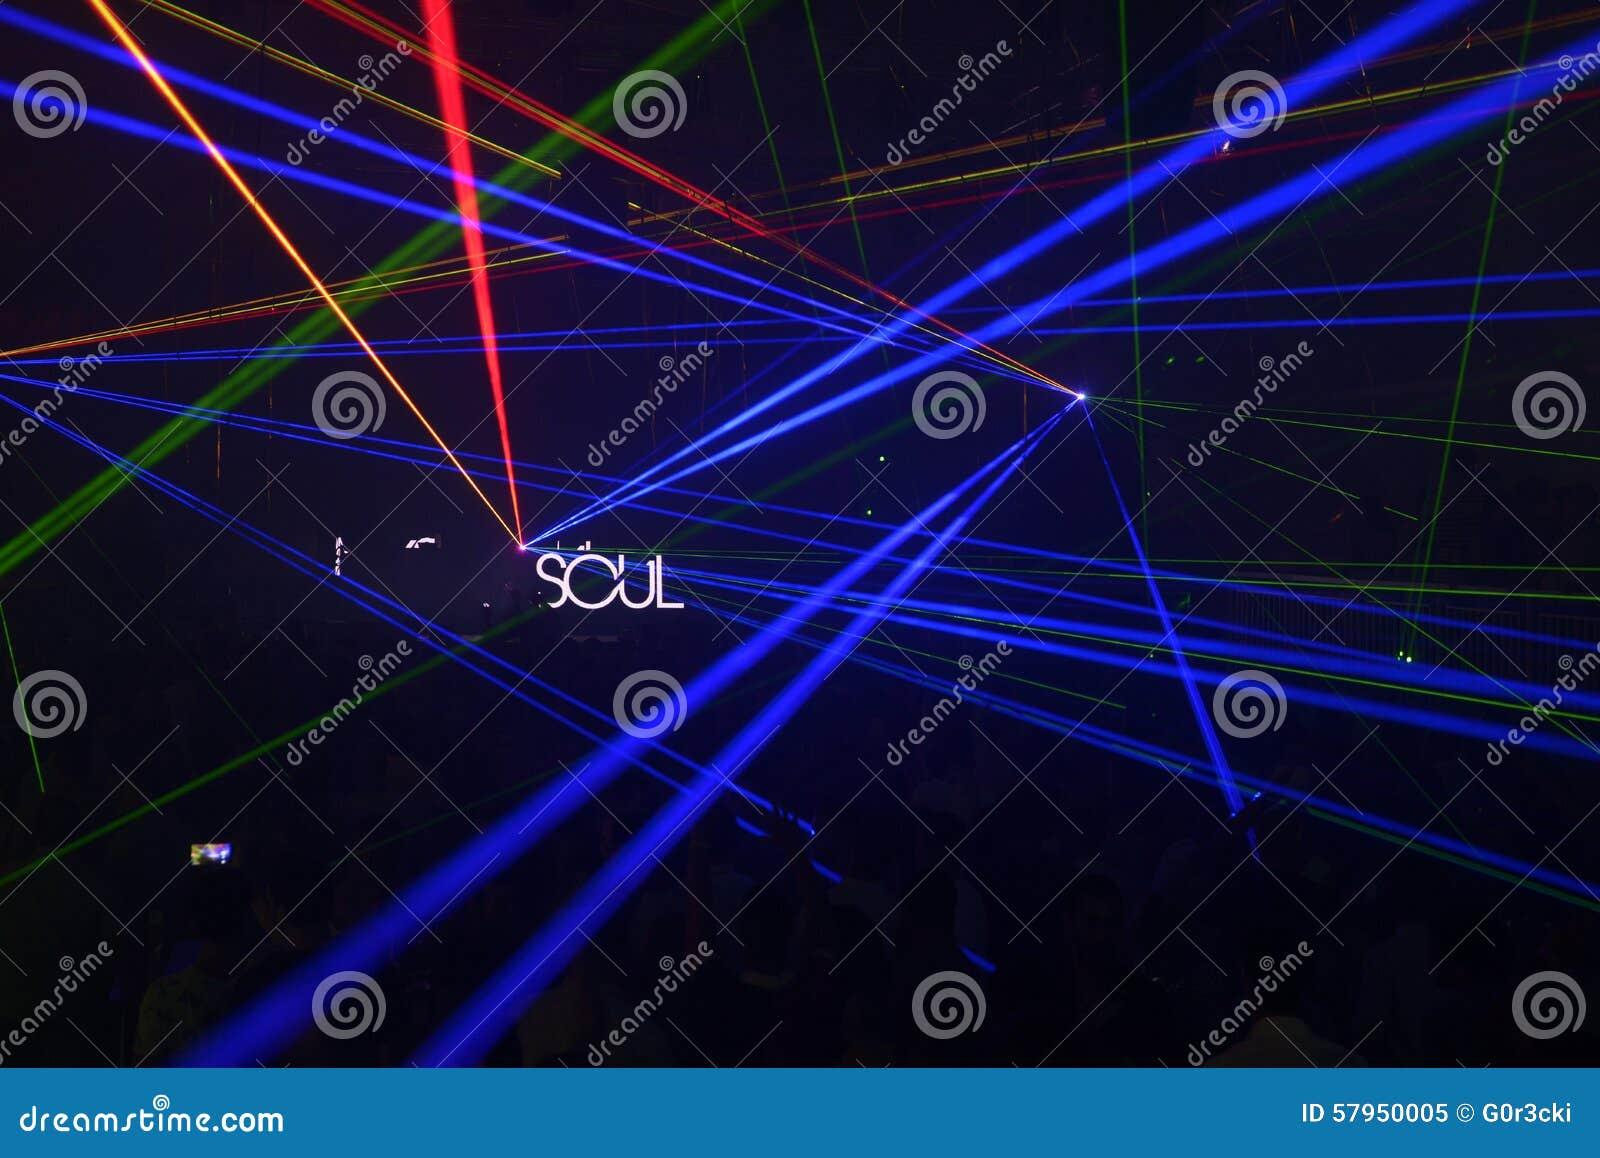 Rave Music, Colorful Lazer Lights, Night Club Soul Stock